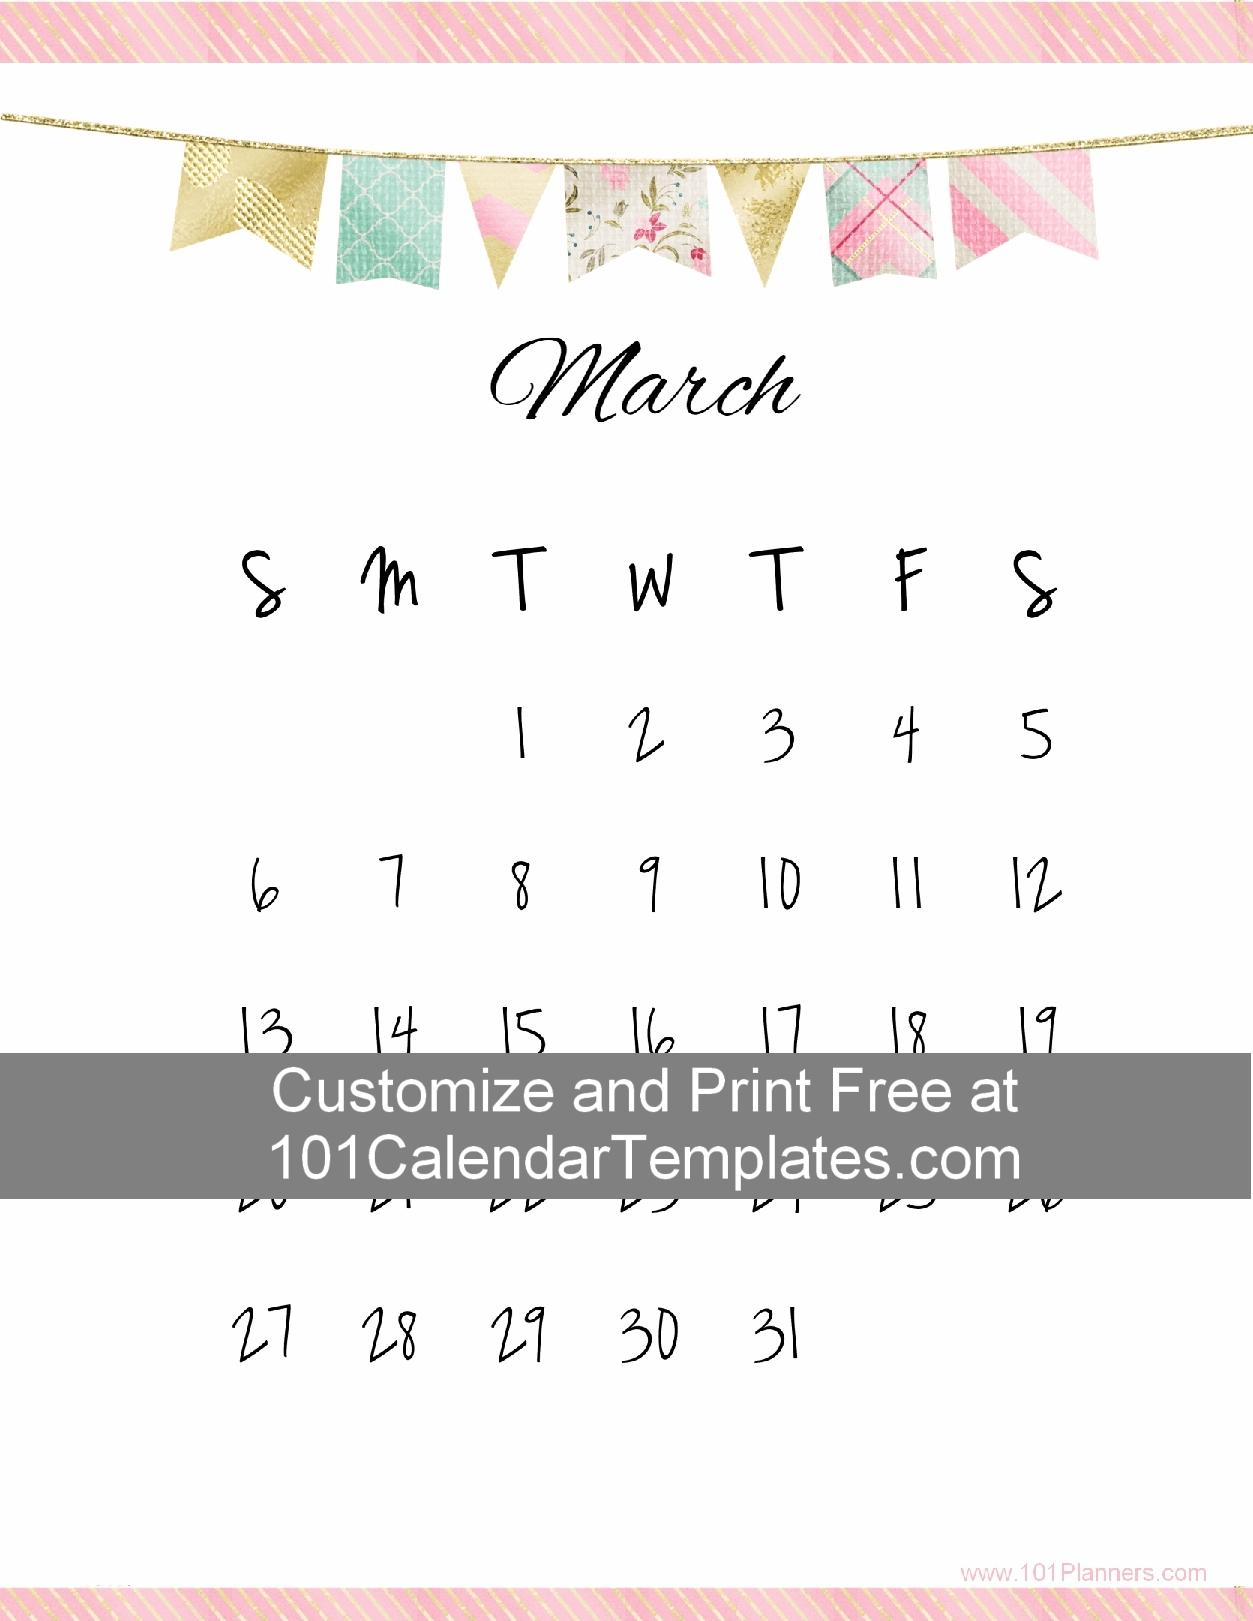 Free Printable Calendar Templates With A Pretty Banner. The Calendar